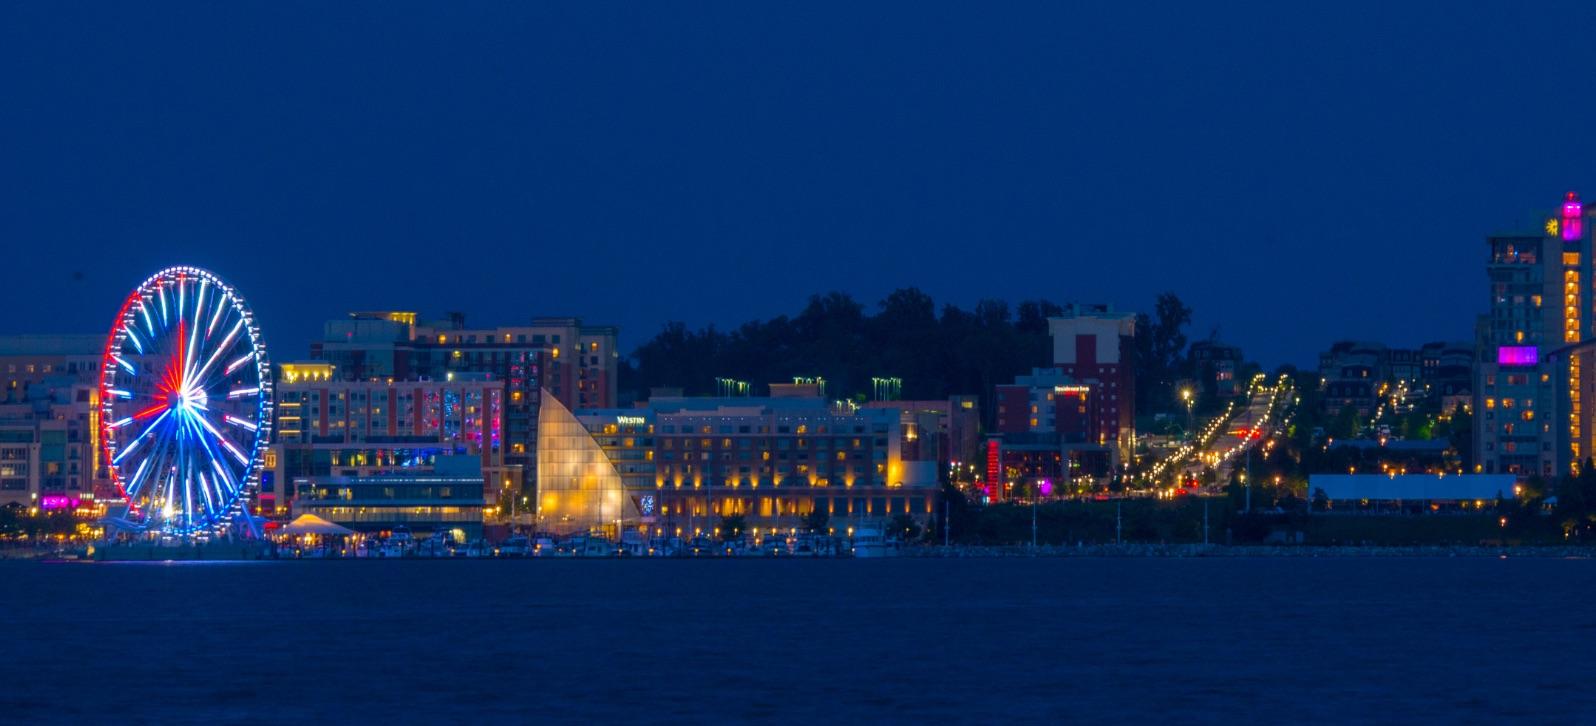 National Harbor - DC Waterfront Resort | National Harbor